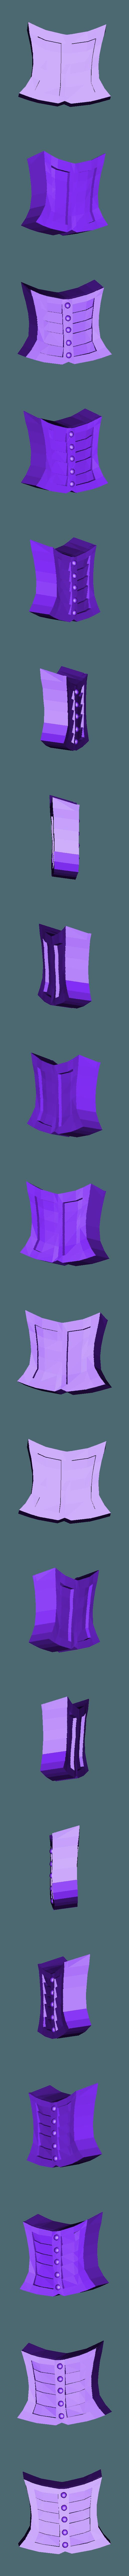 headdress.stl Download free STL file Rubric Marines • 3D printer design, Mazer